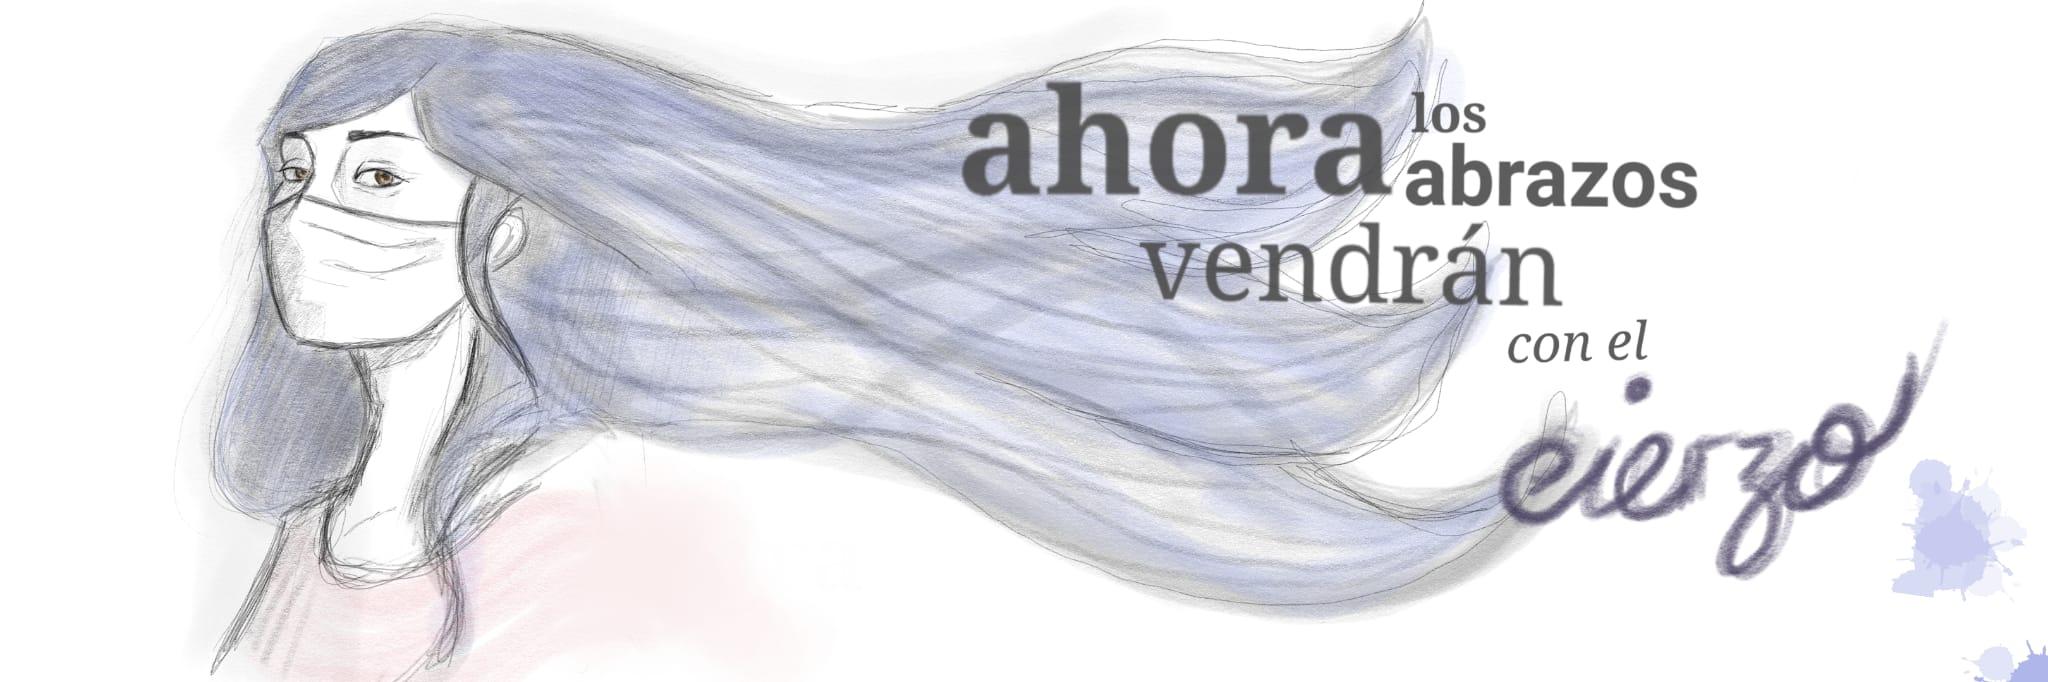 Mireia Clavero - Cierzo - Digital